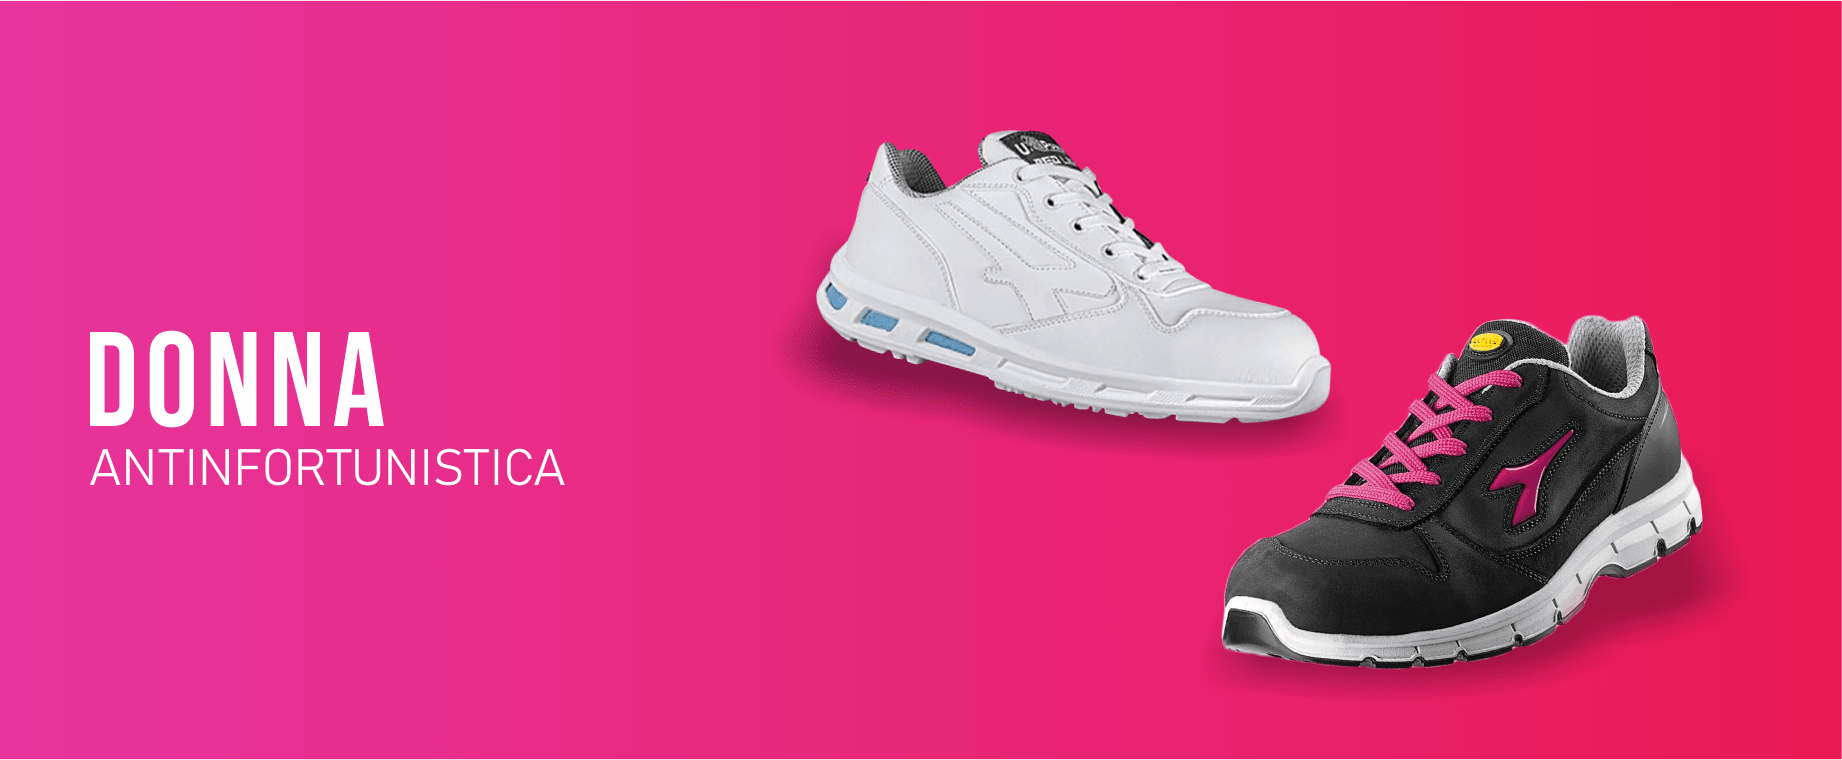 banner-home-scarpe-antinfortunistica-donna